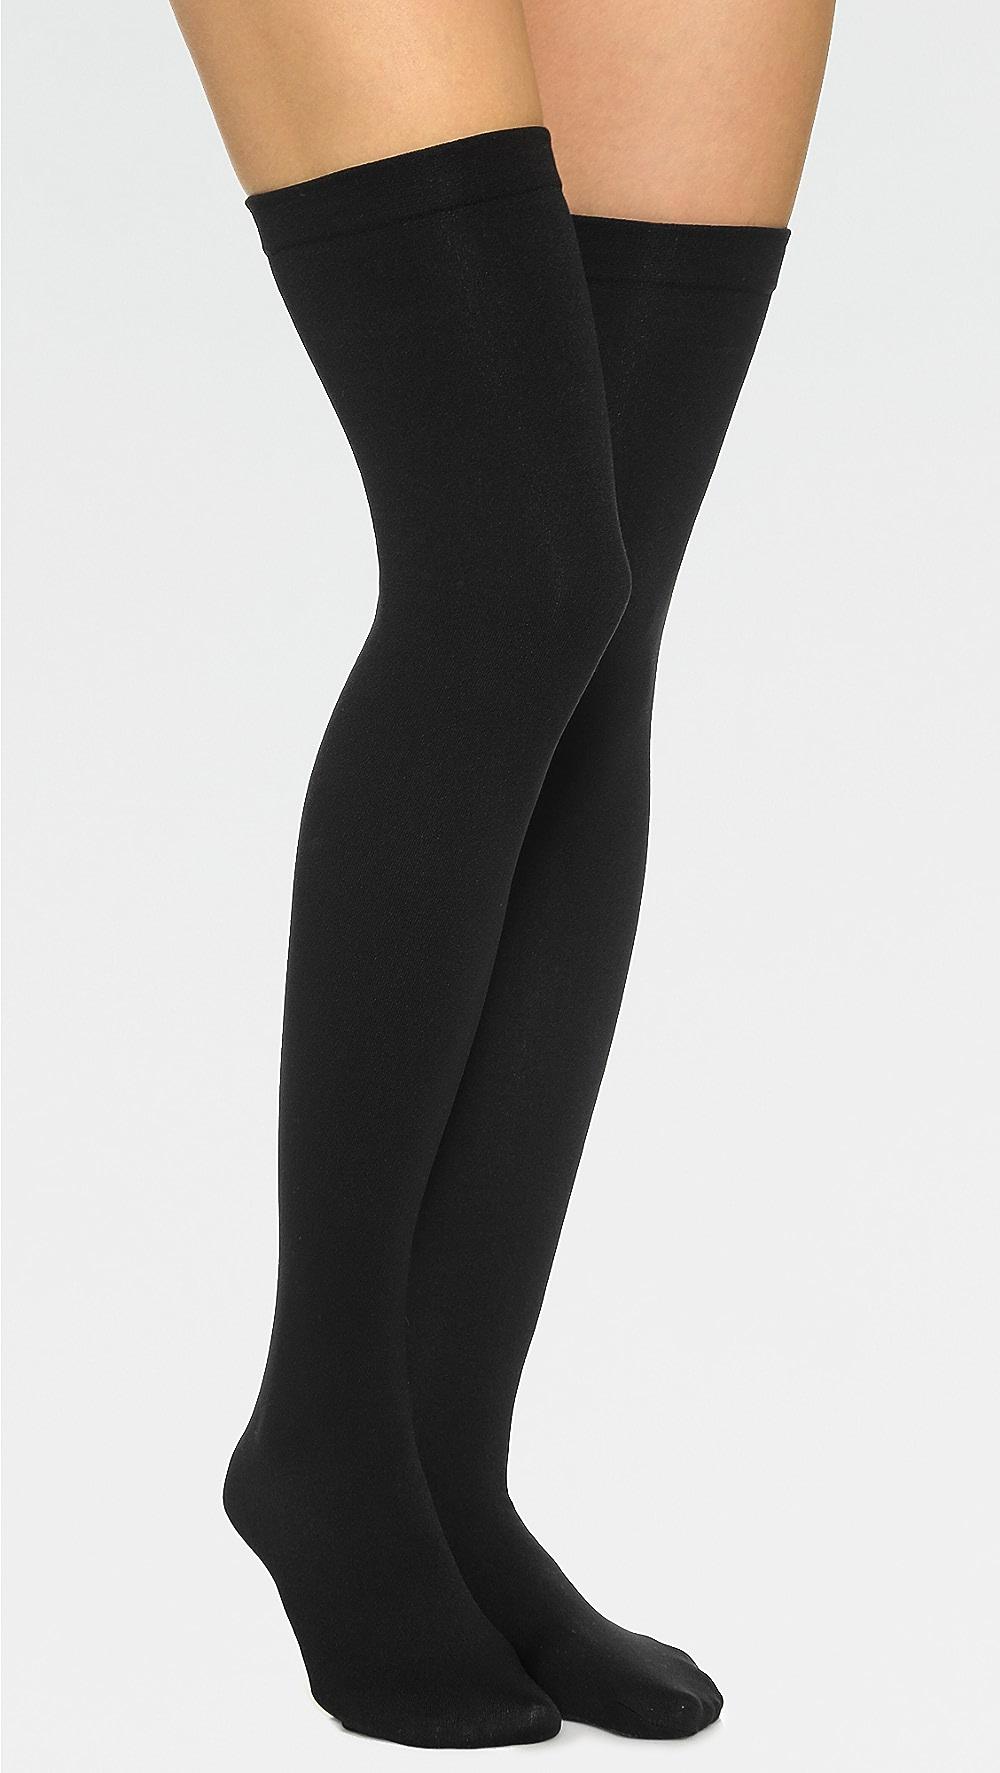 Hard-Working Plush - Fleece Lined Thigh High Socks Reasonable Price